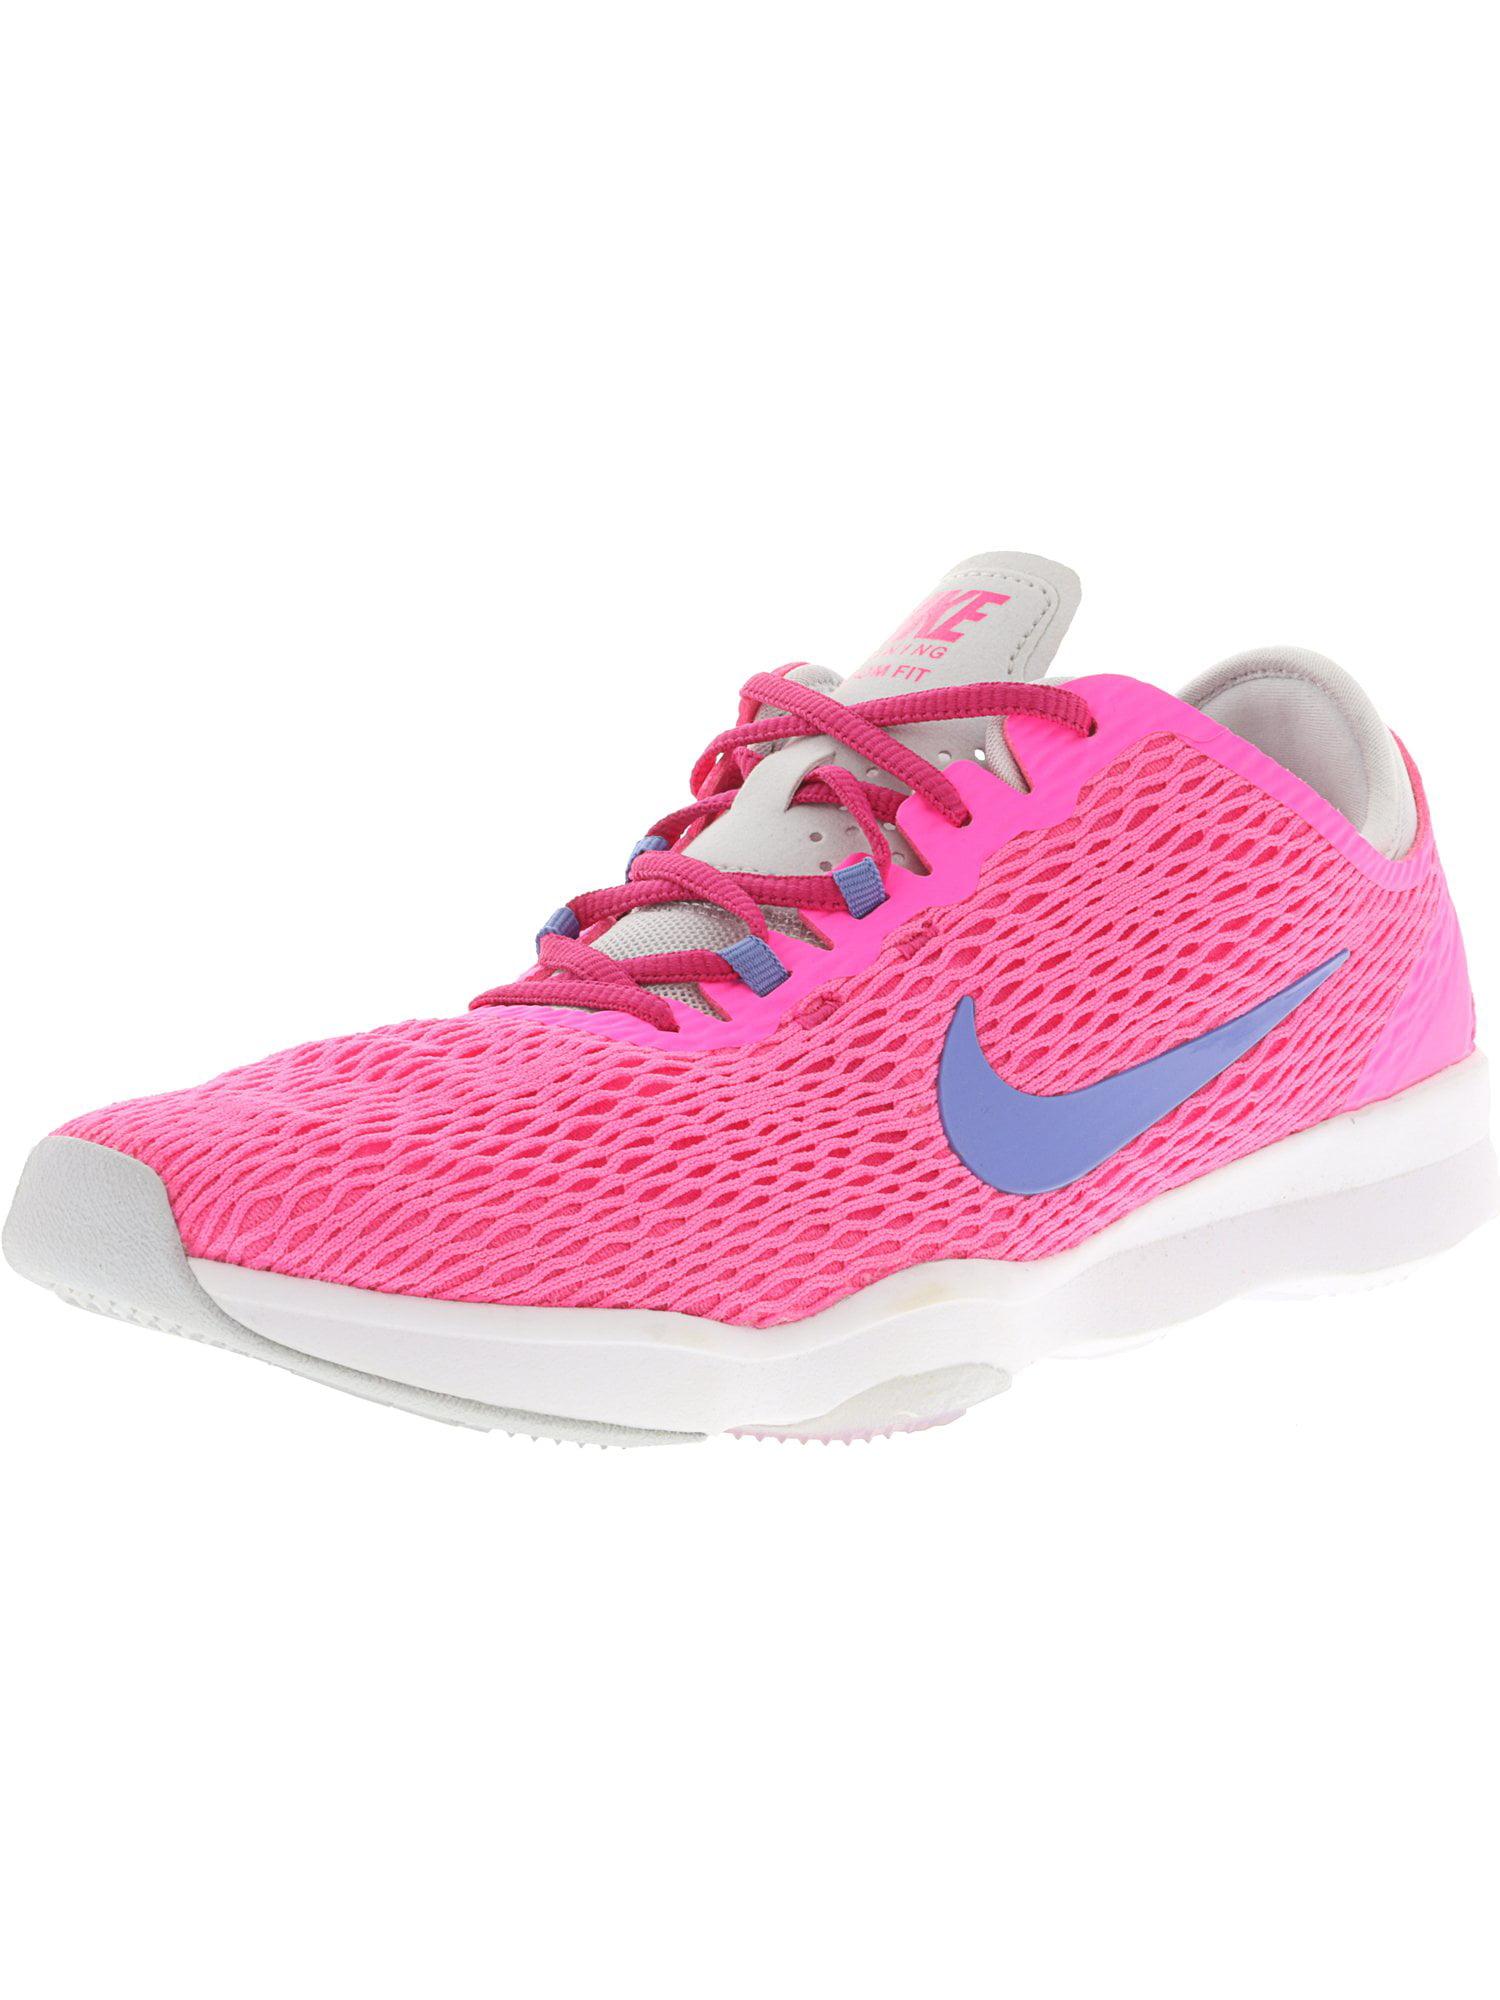 Mesh Cross Trainer Shoe - 6.5